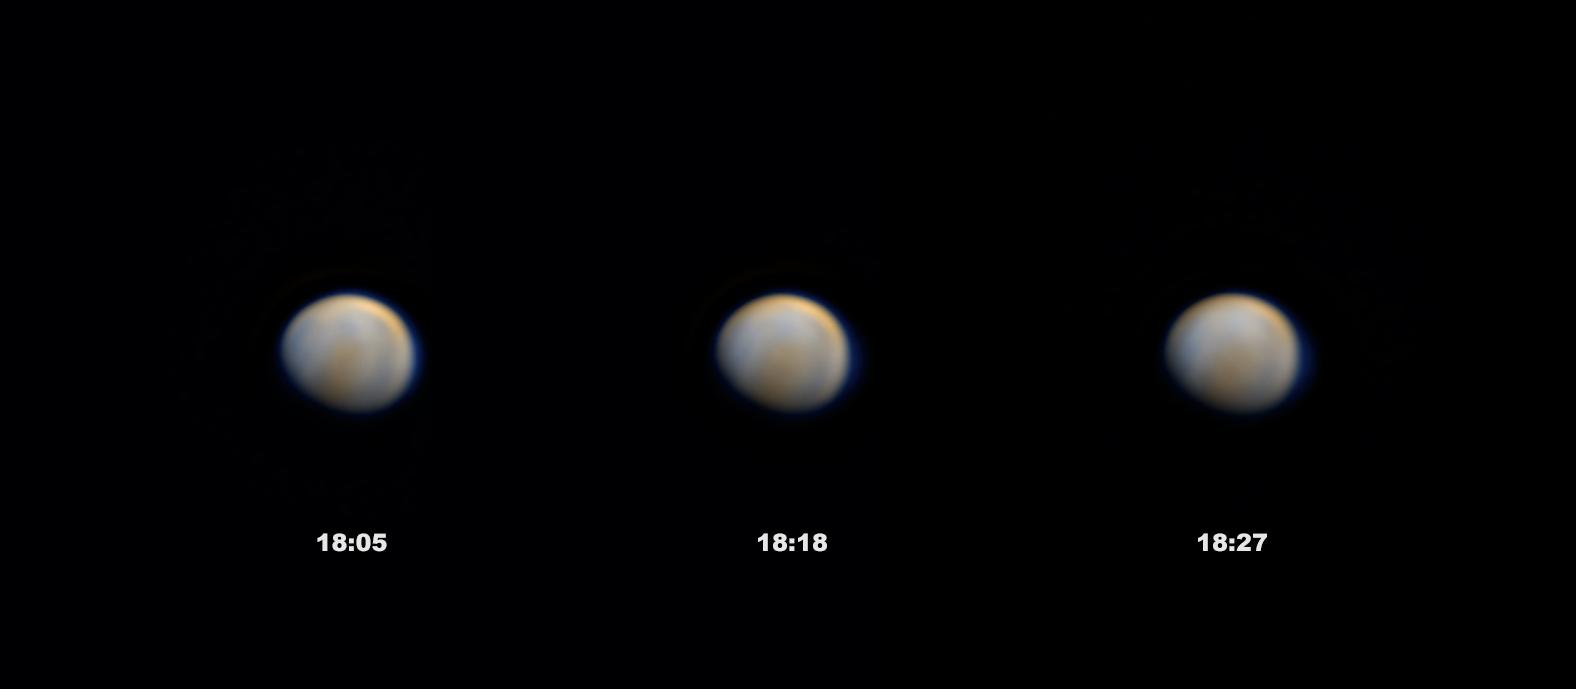 Venus20180420SCT8ASI178MMC.jpg.365e95180e765507912718f14970acb7.jpg